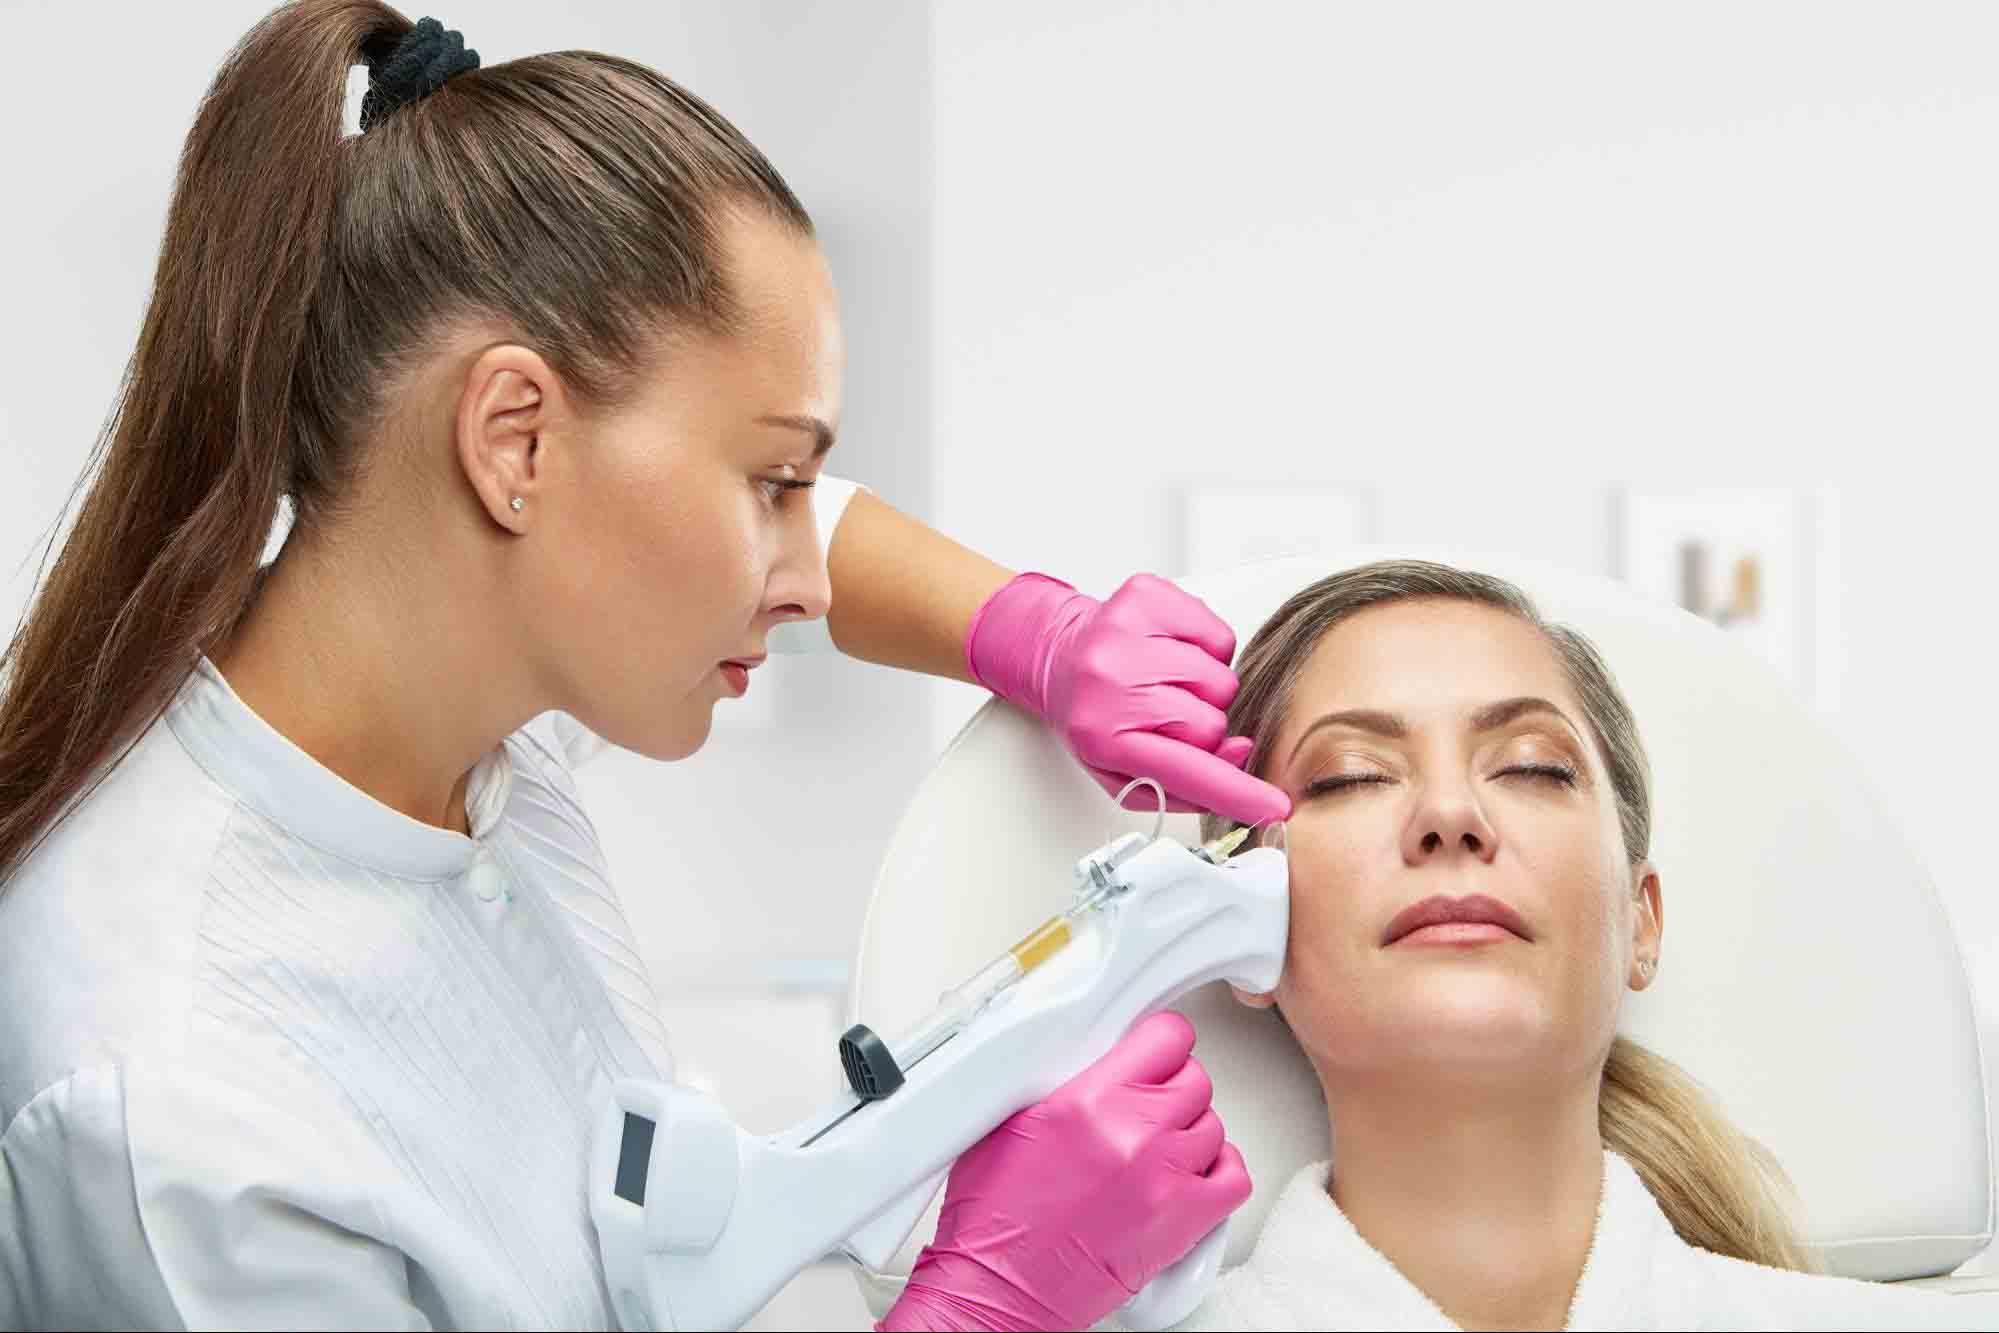 equipamentos clinica estetica por que sao necessarios